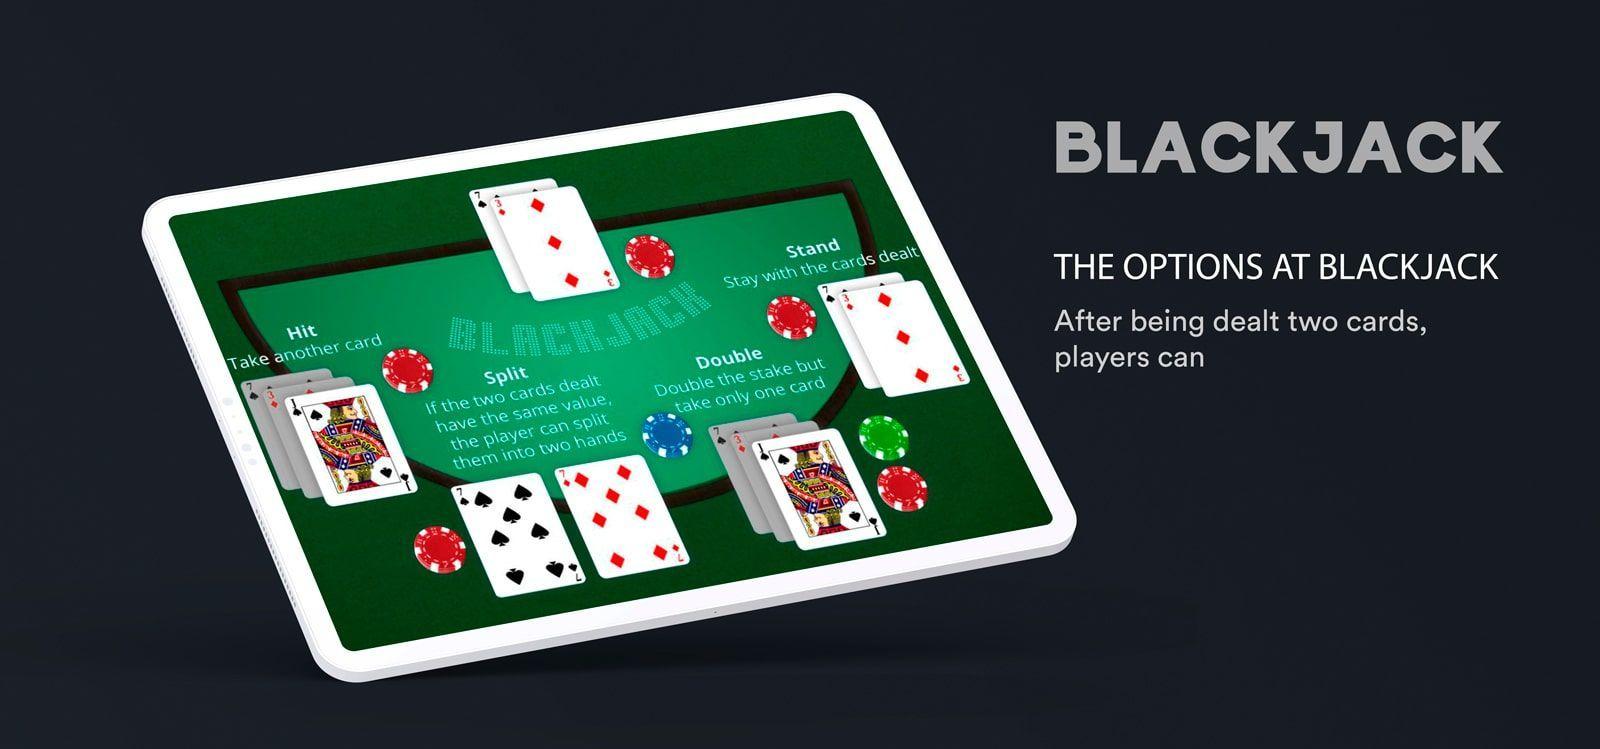 Blackjack Rules Online Secrets 2020 in 2020 Blackjack